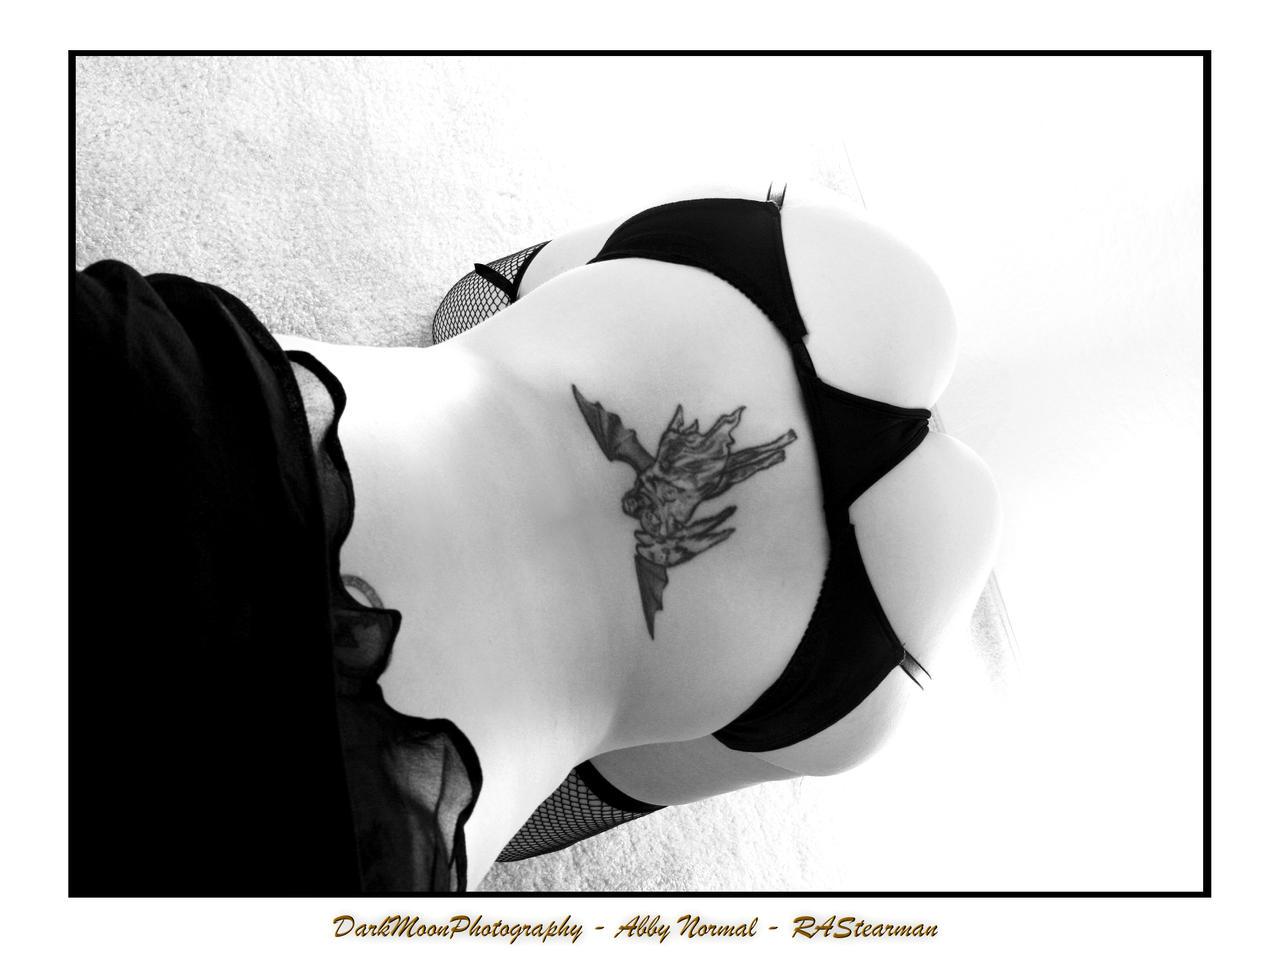 AbbyNormal-1783-BW-WP-Master by darkmoonphoto